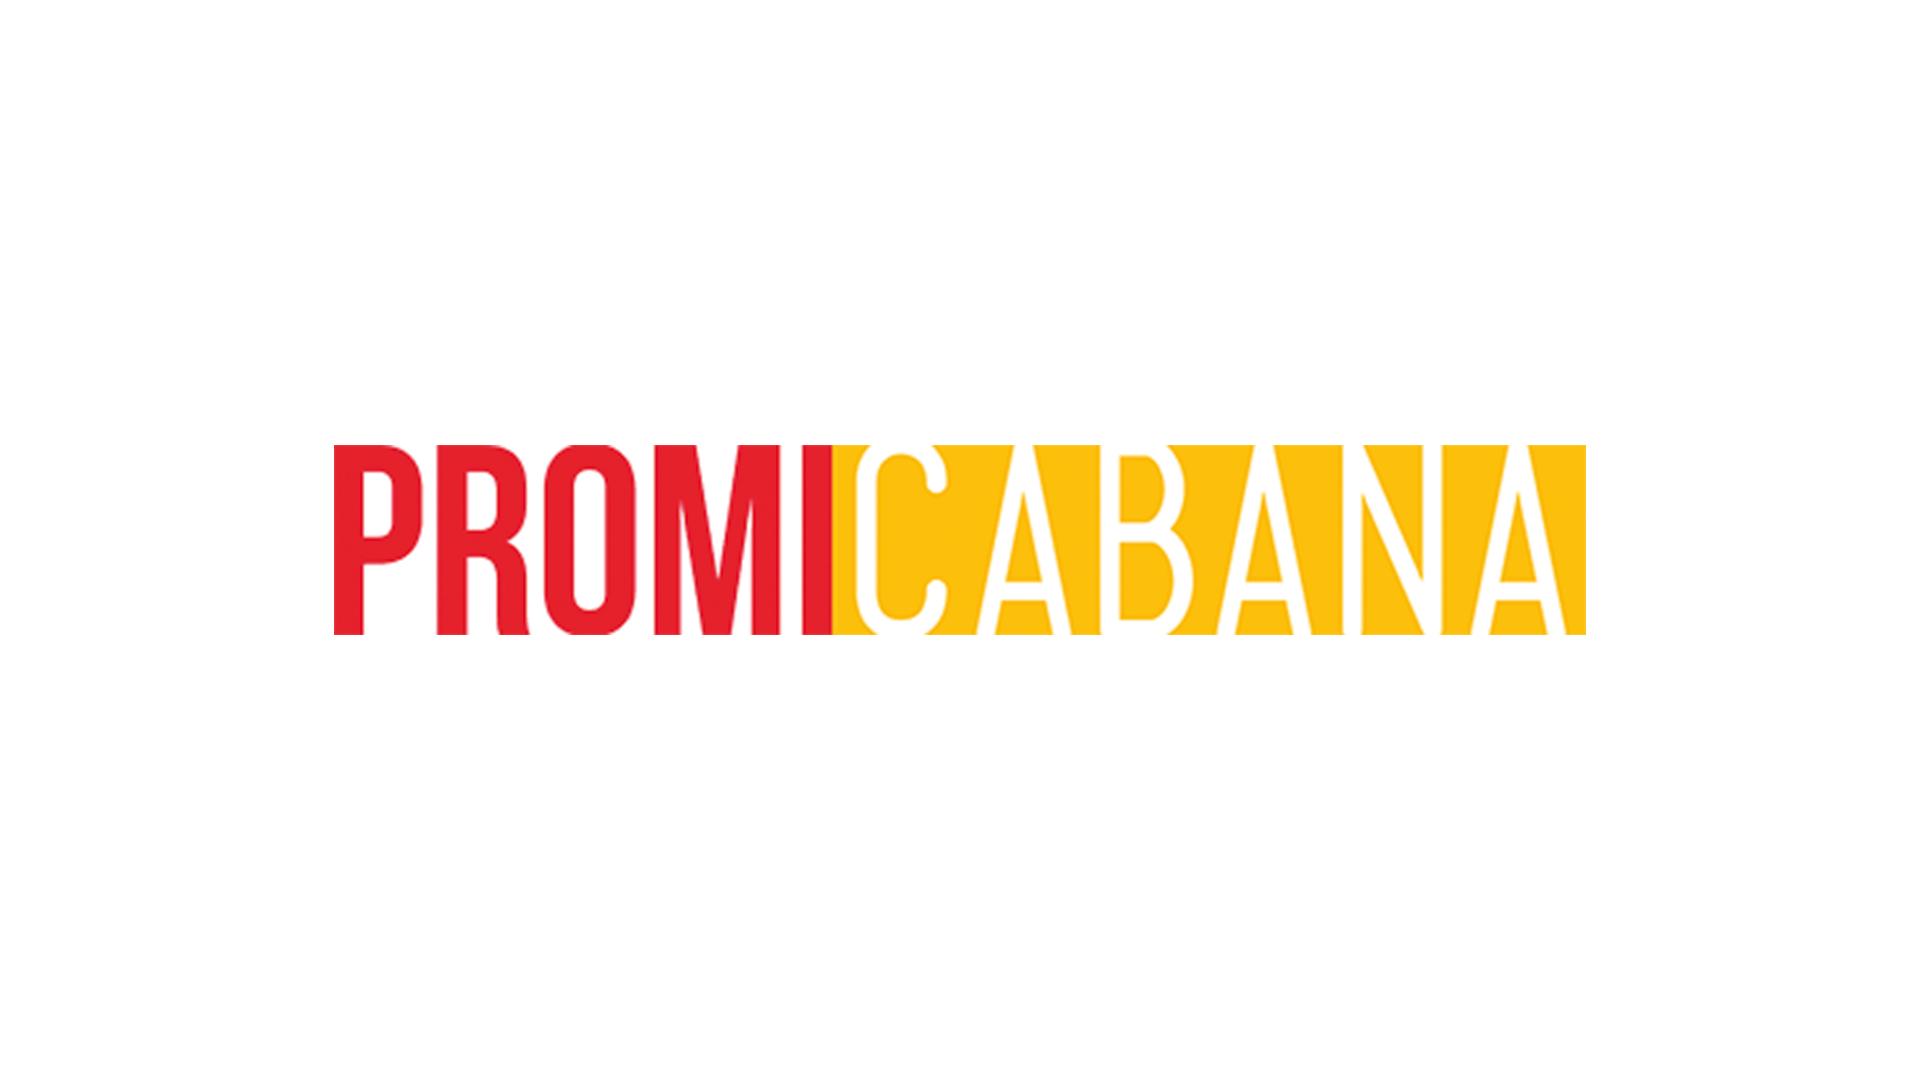 Donald-Trump-Robert-Pattinson